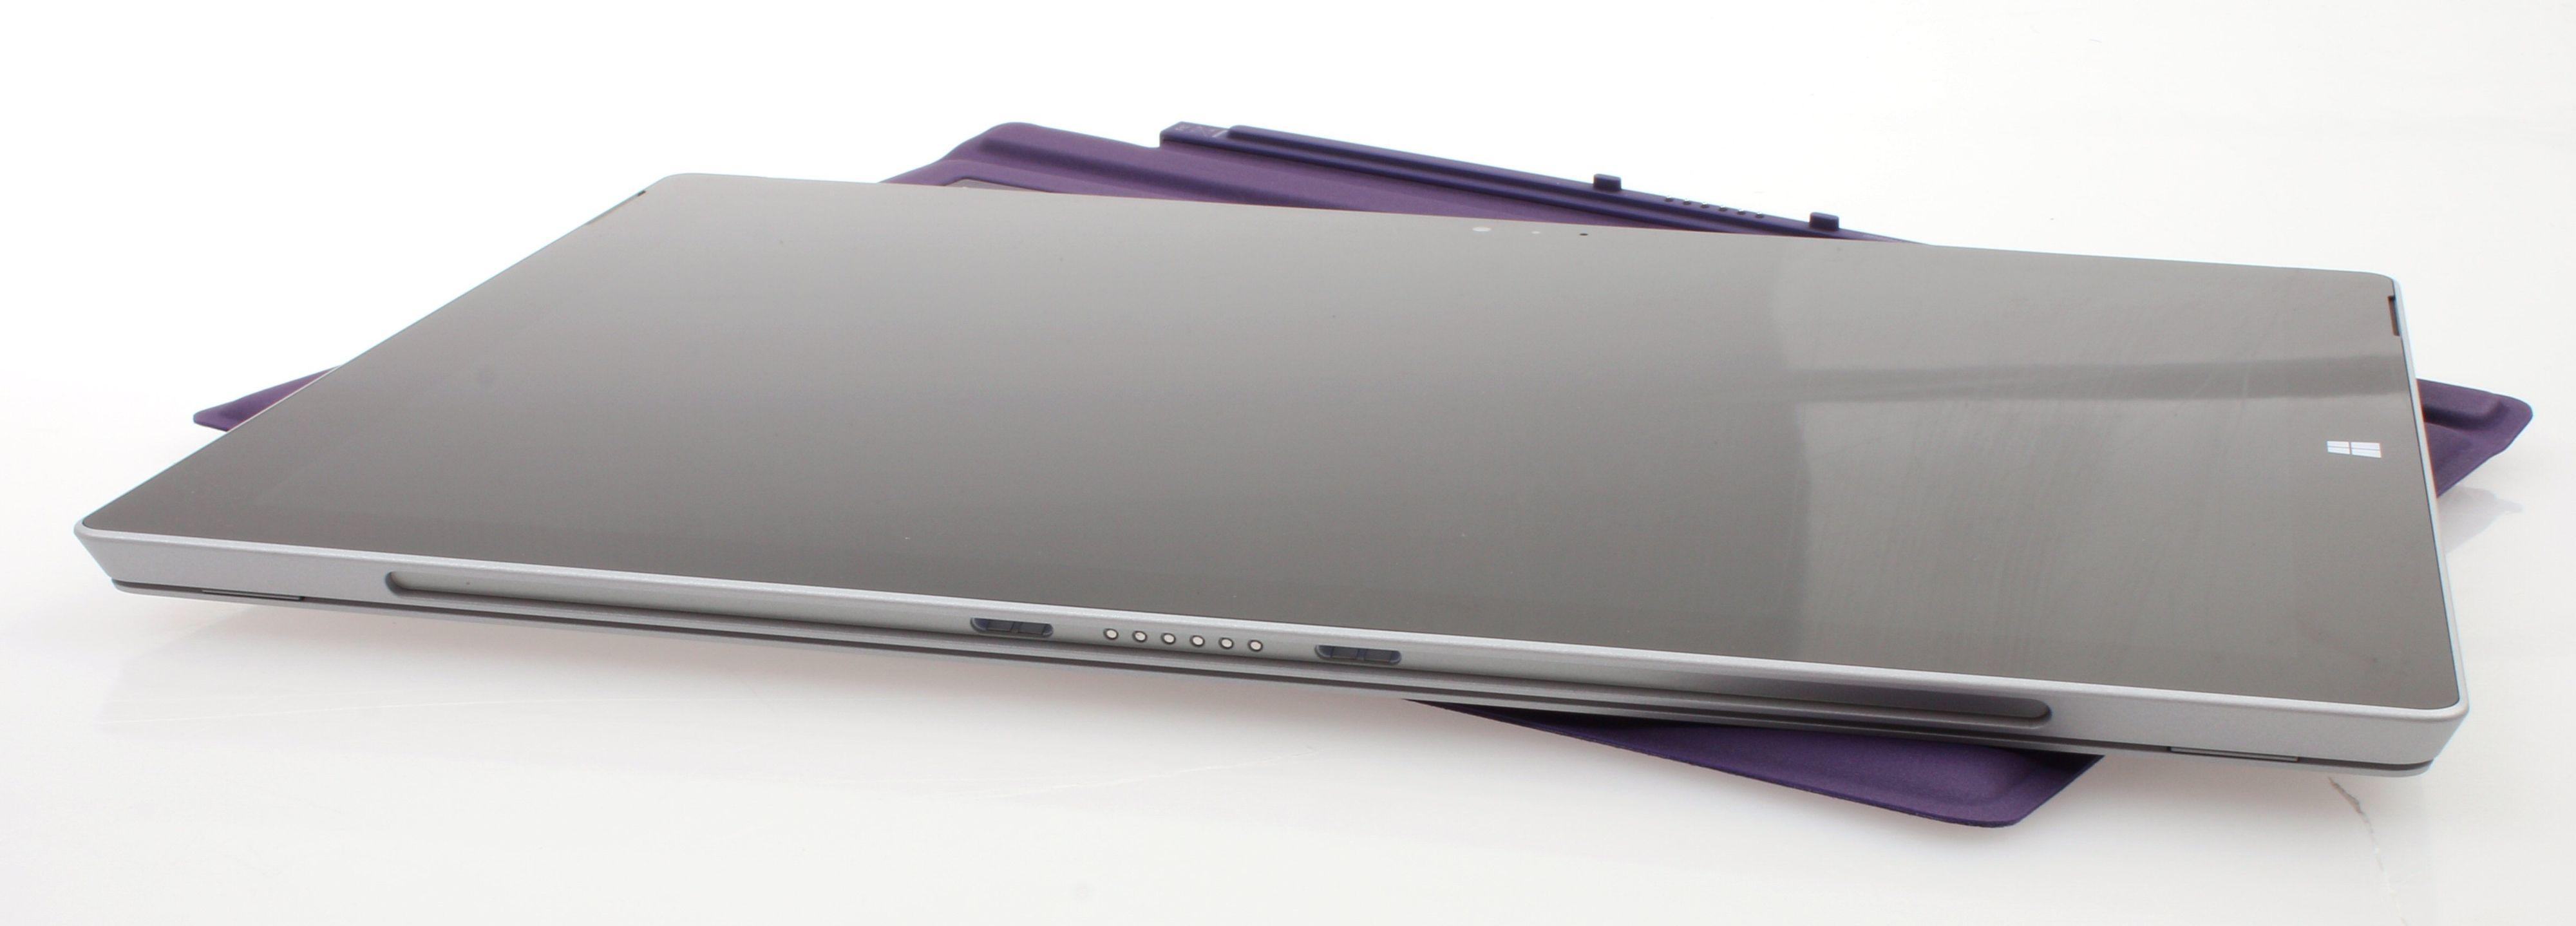 Uten tastatur er Surface Pro 3 kun ni millimeter tykk.Foto: Vegar Jansen, Hardware.no